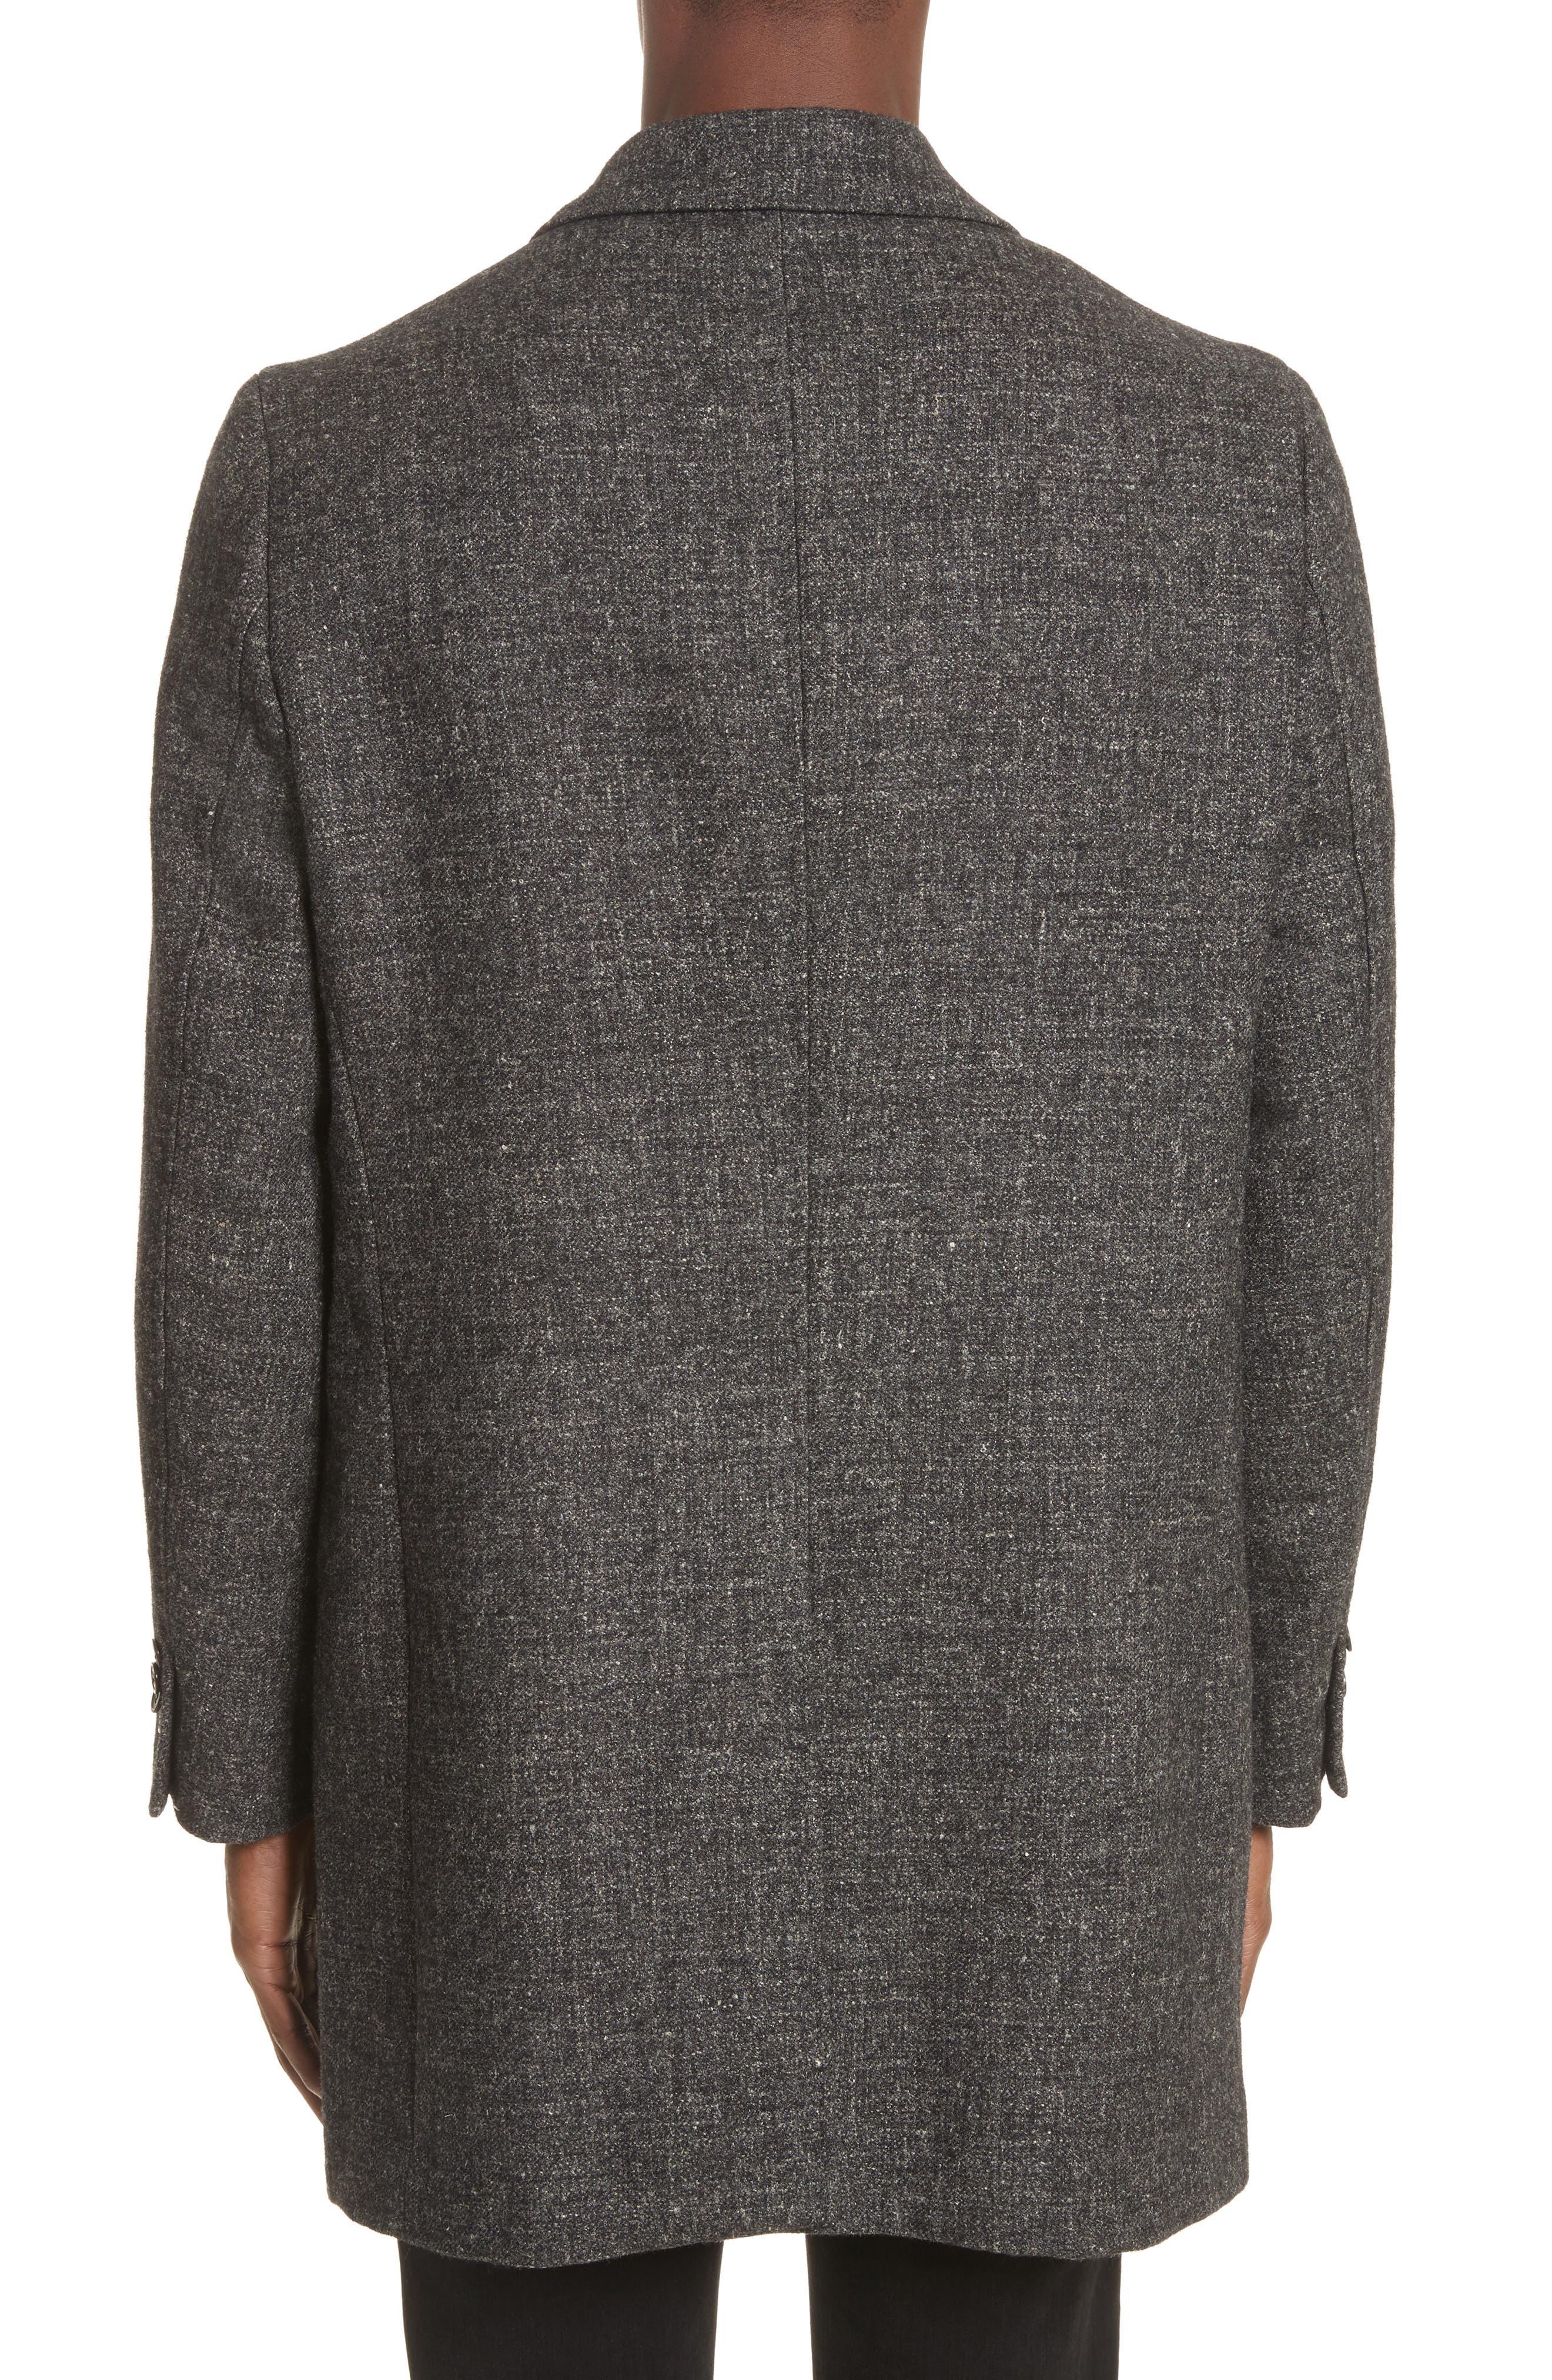 Walsh Wool & Linen Topcoat,                             Alternate thumbnail 2, color,                             Black/ Grey